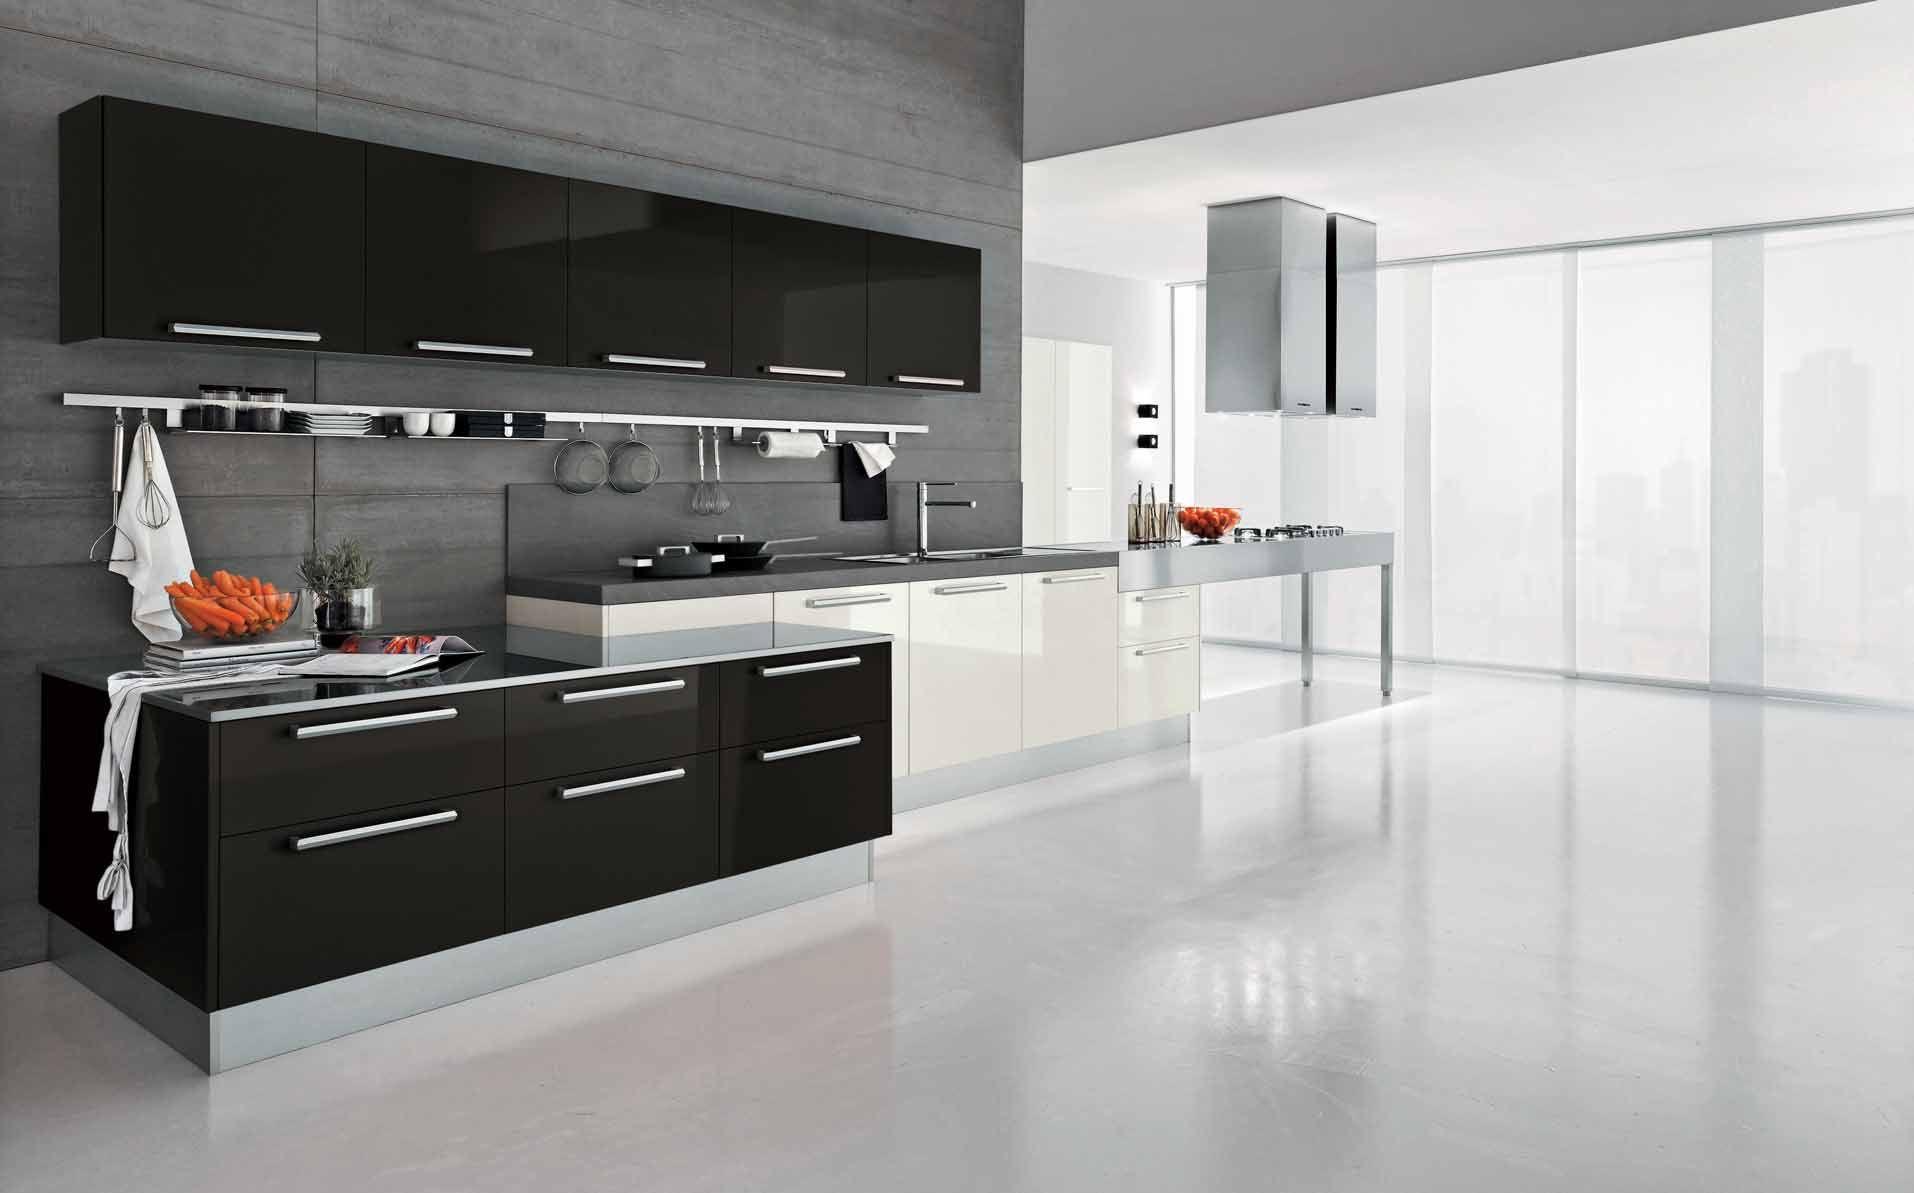 ^ 1000+ images about Kitchen abinet on Pinterest Modern kitchen ...